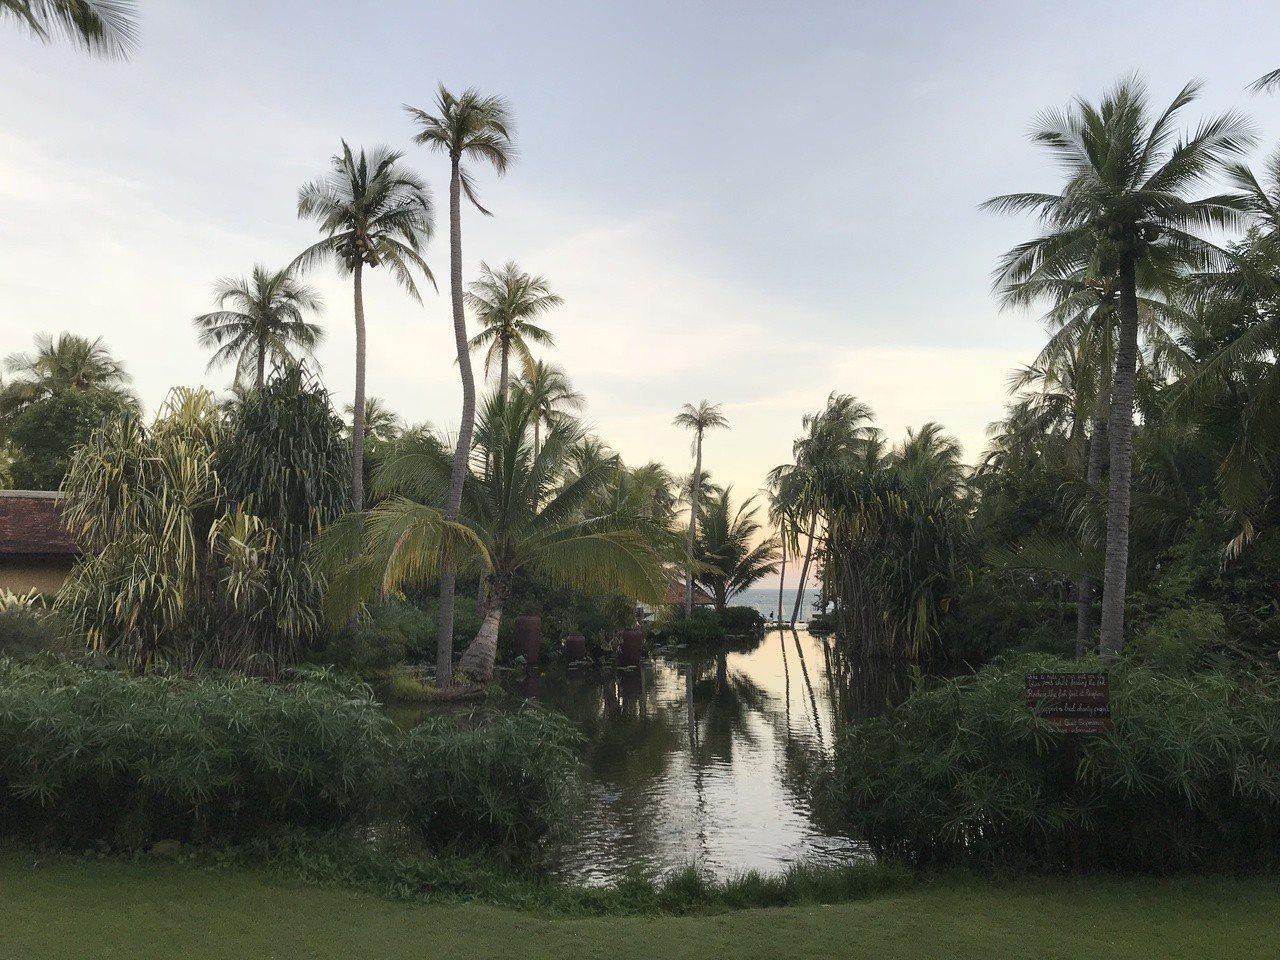 Anantara Resort度假酒店內部景緻 。記者黃日暉/攝影